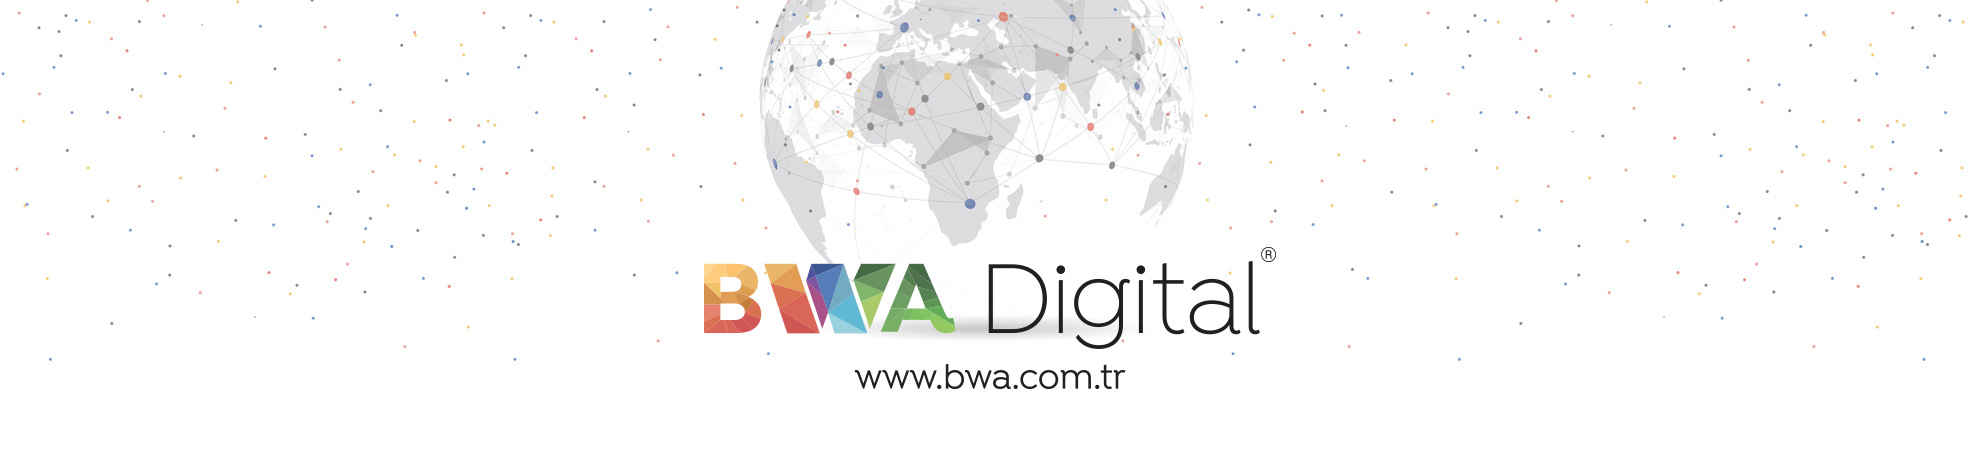 BWA Digital banner fotograf